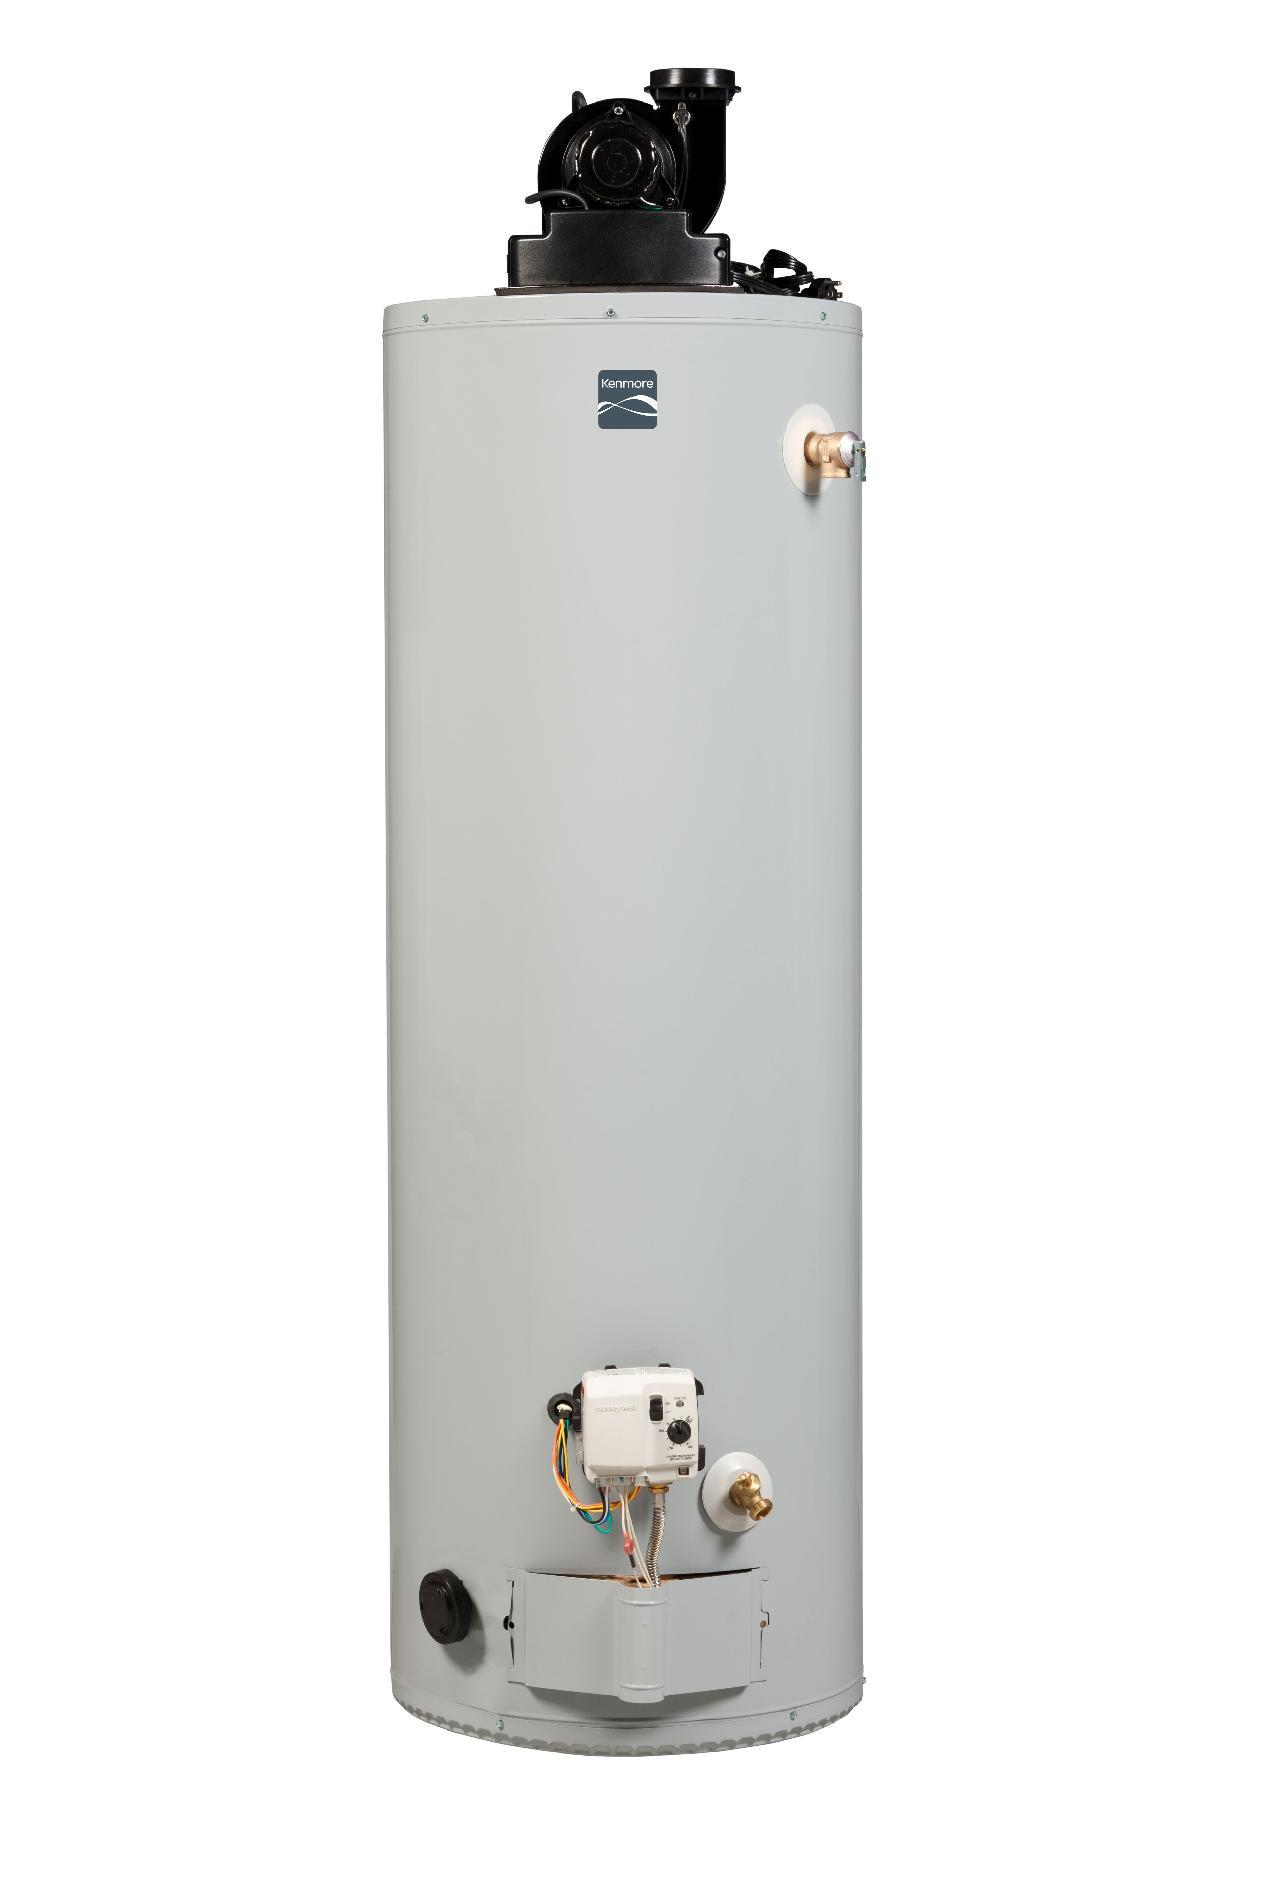 spin prod 869229412 hei 333 wid 333 op sharpen 1 kenmore 33136 50 gal gas power vent water heater wiring diagram  [ 1266 x 1900 Pixel ]